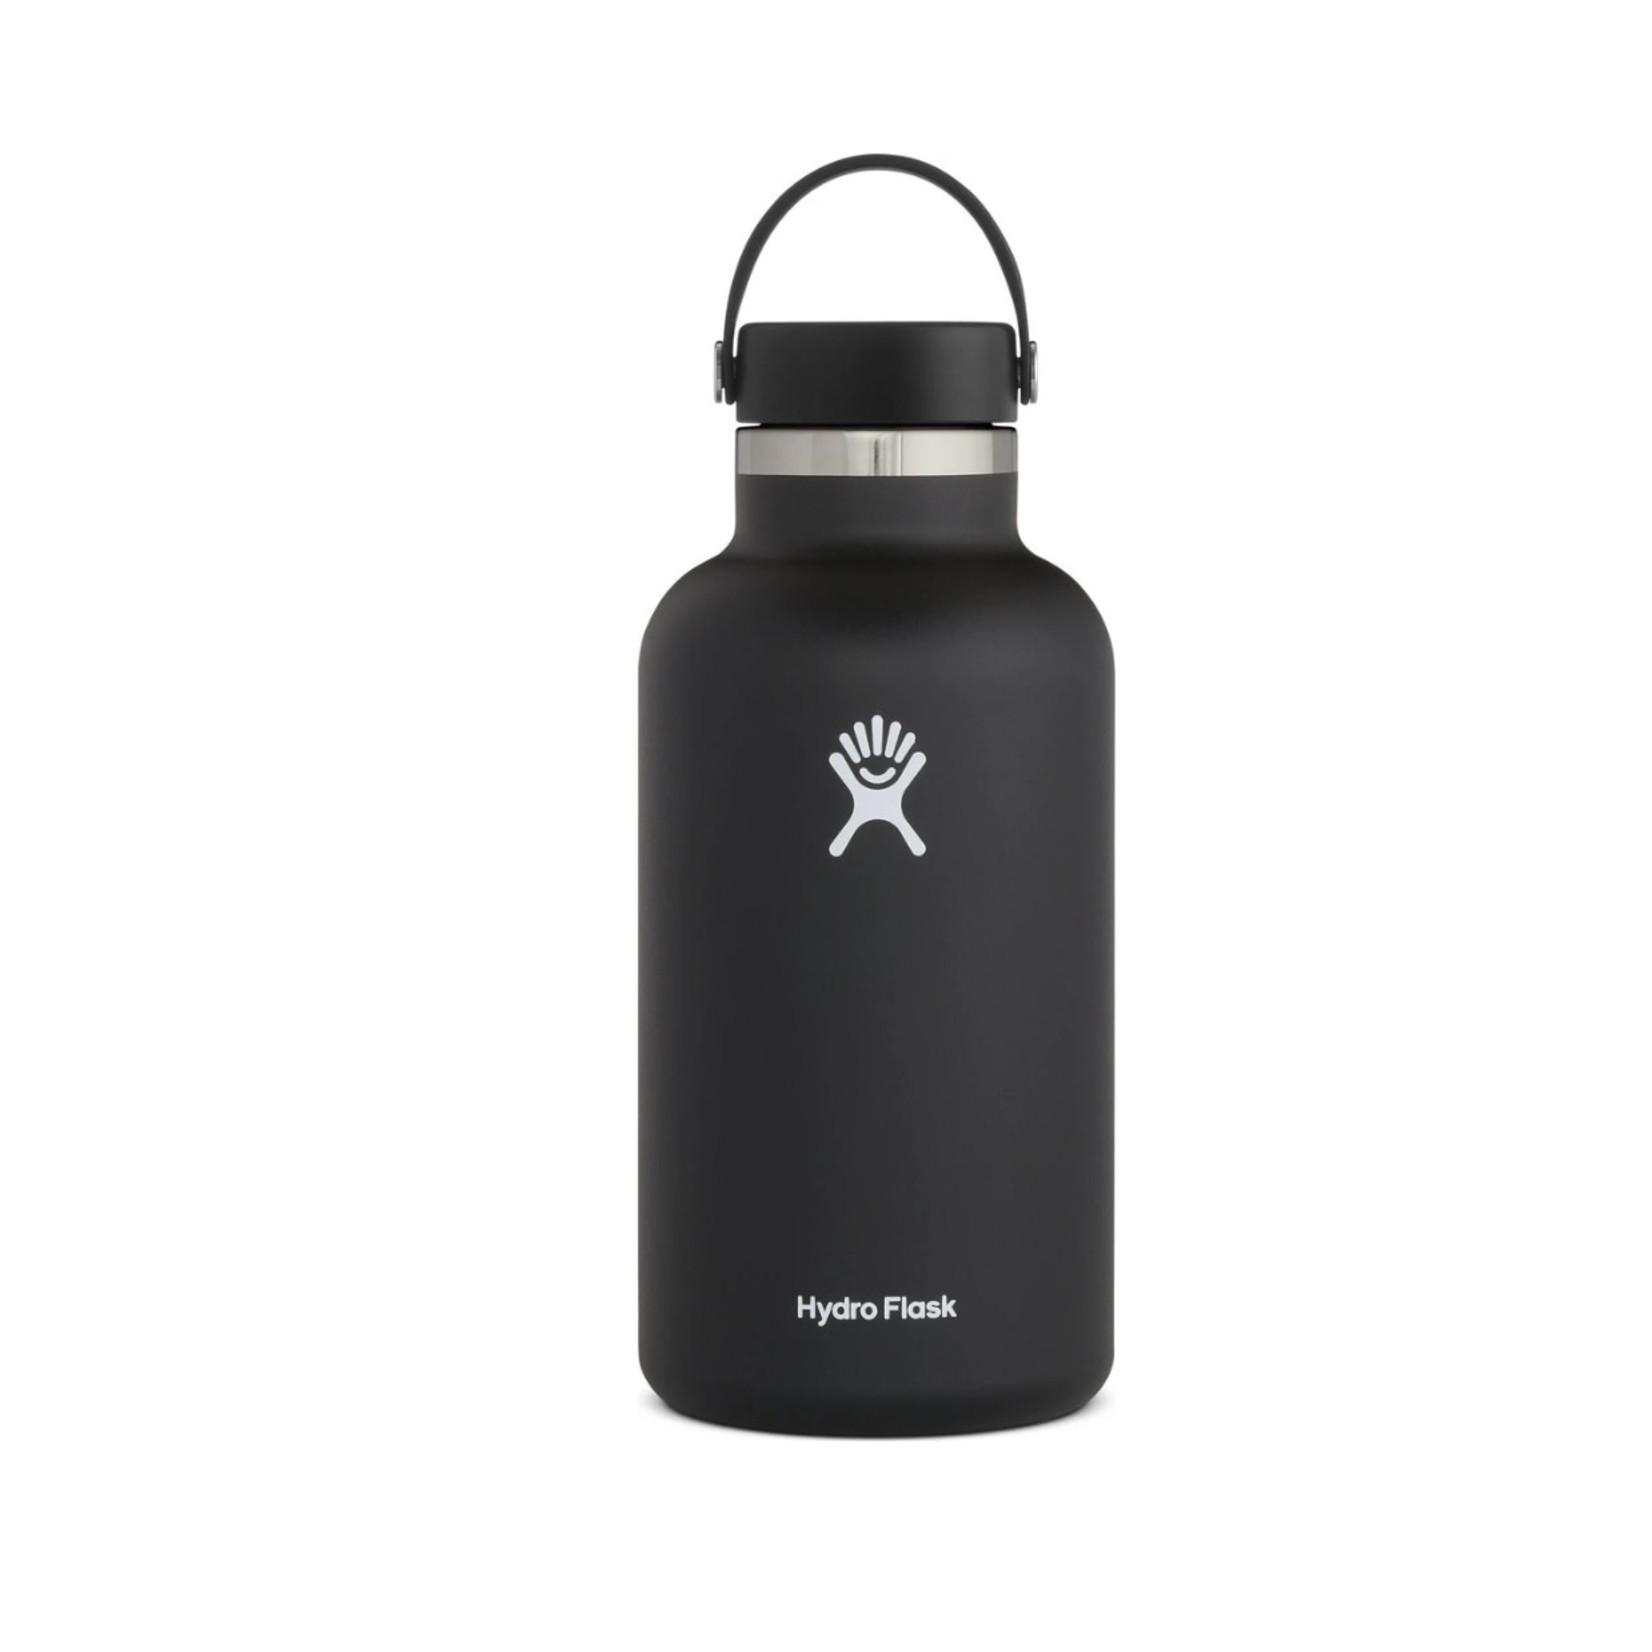 Hydro Flask Hydro Flask 64 oz. Wide Mouth w/ Flex Cap- Black